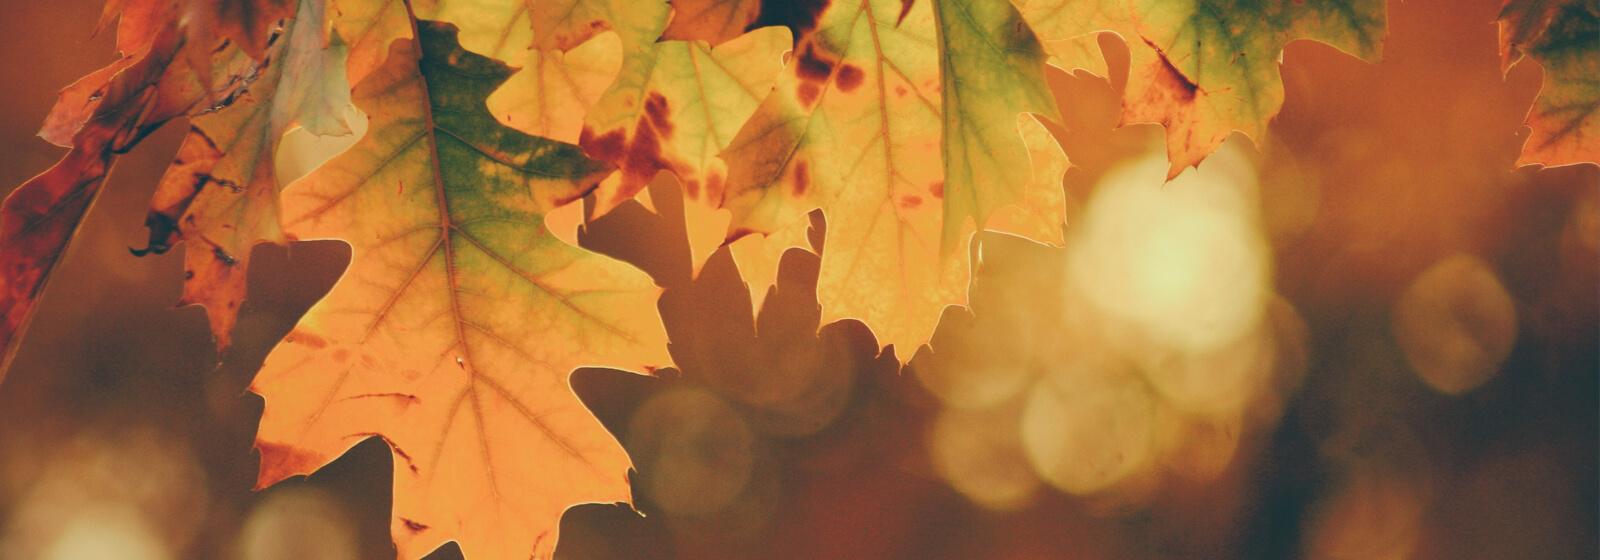 Fall Leaves image slide